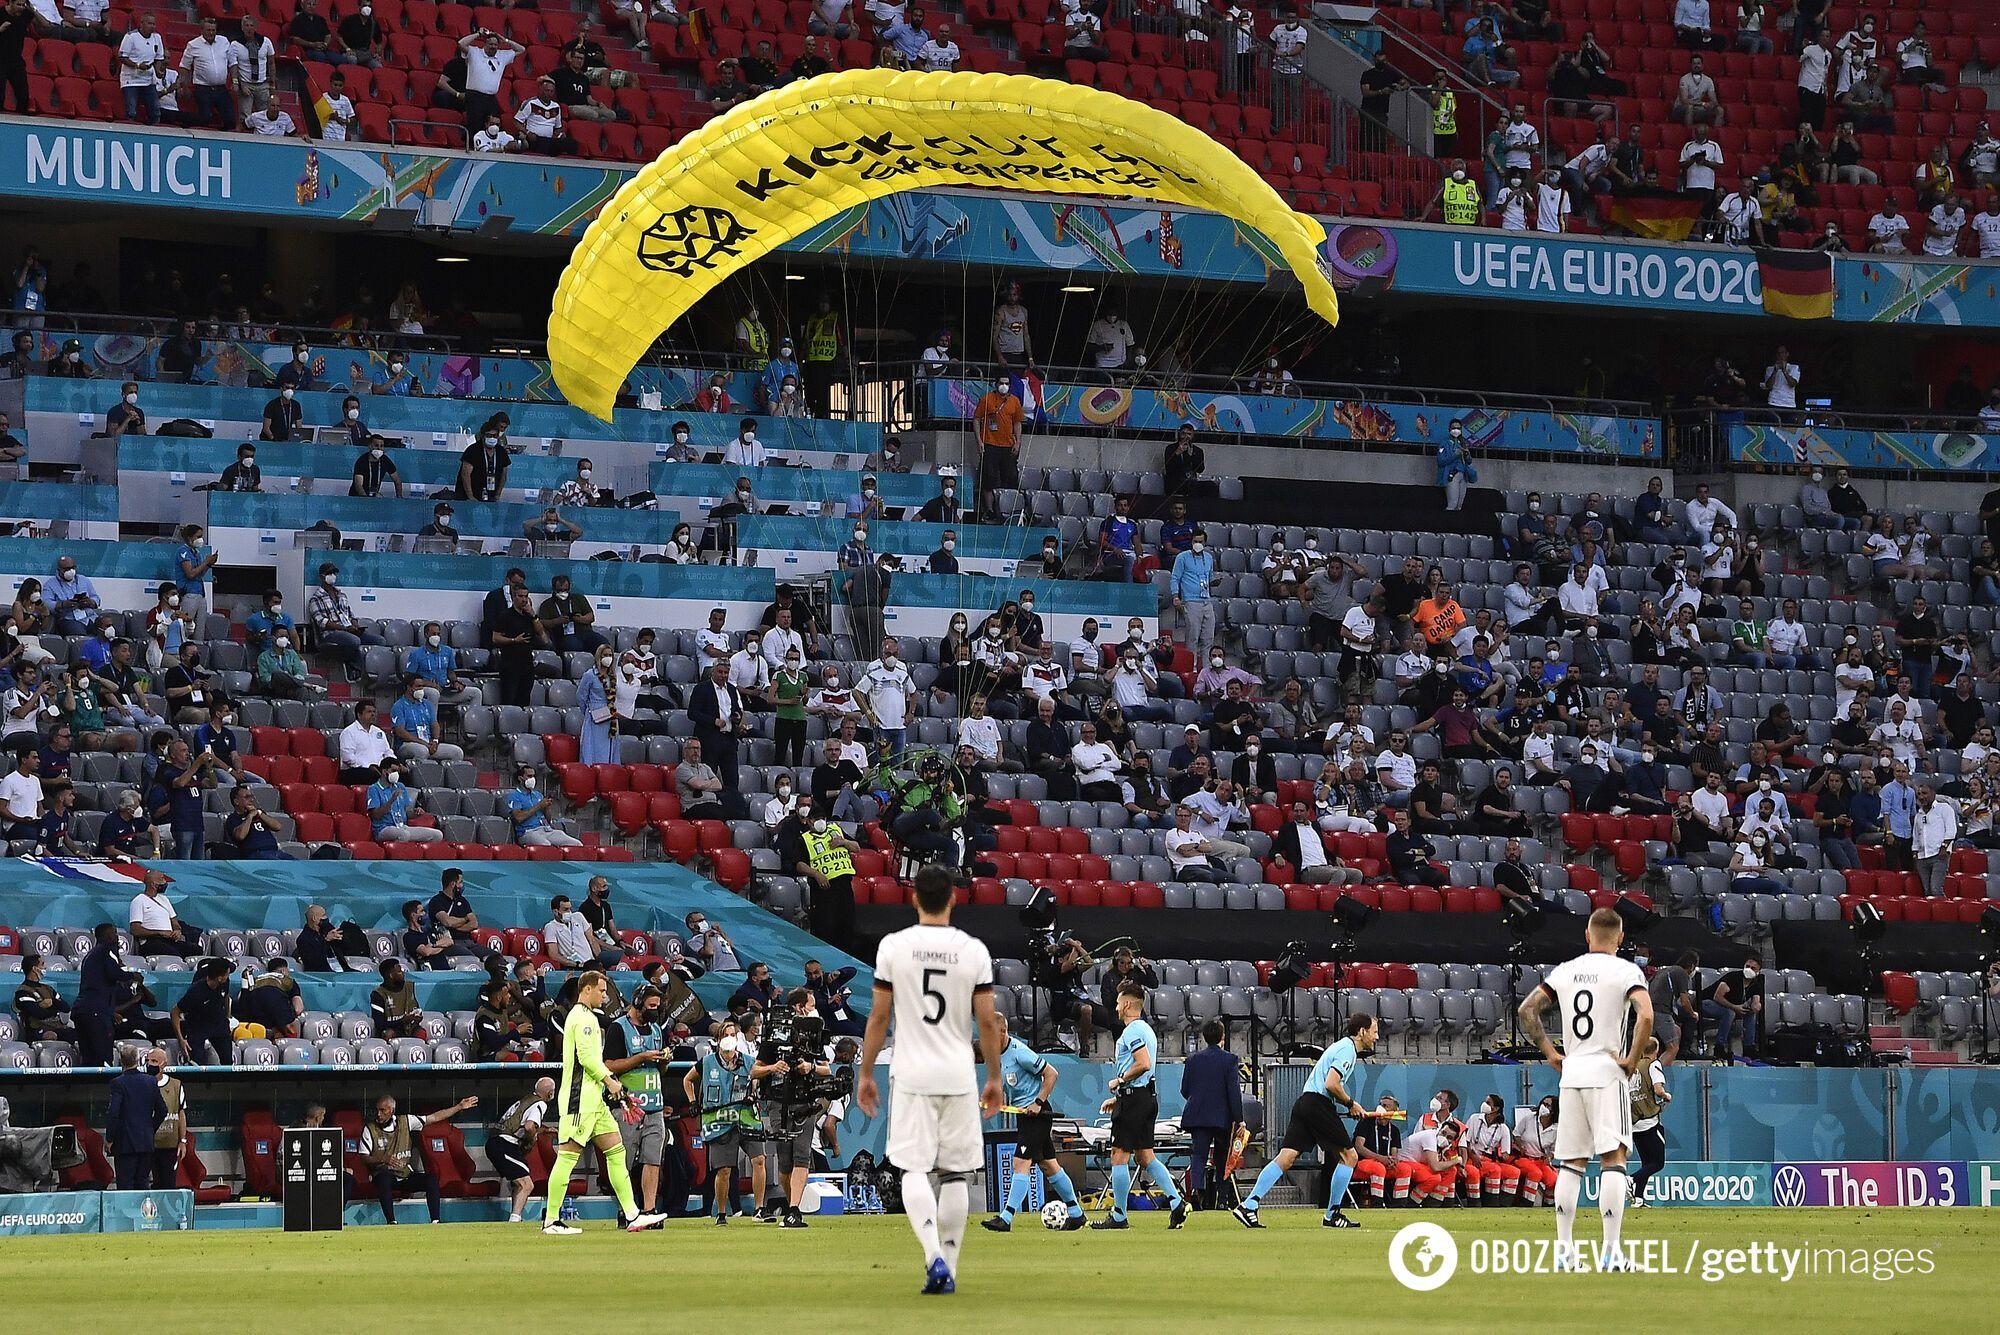 Активист Greenpeace приземлился на поле перед стартом матча